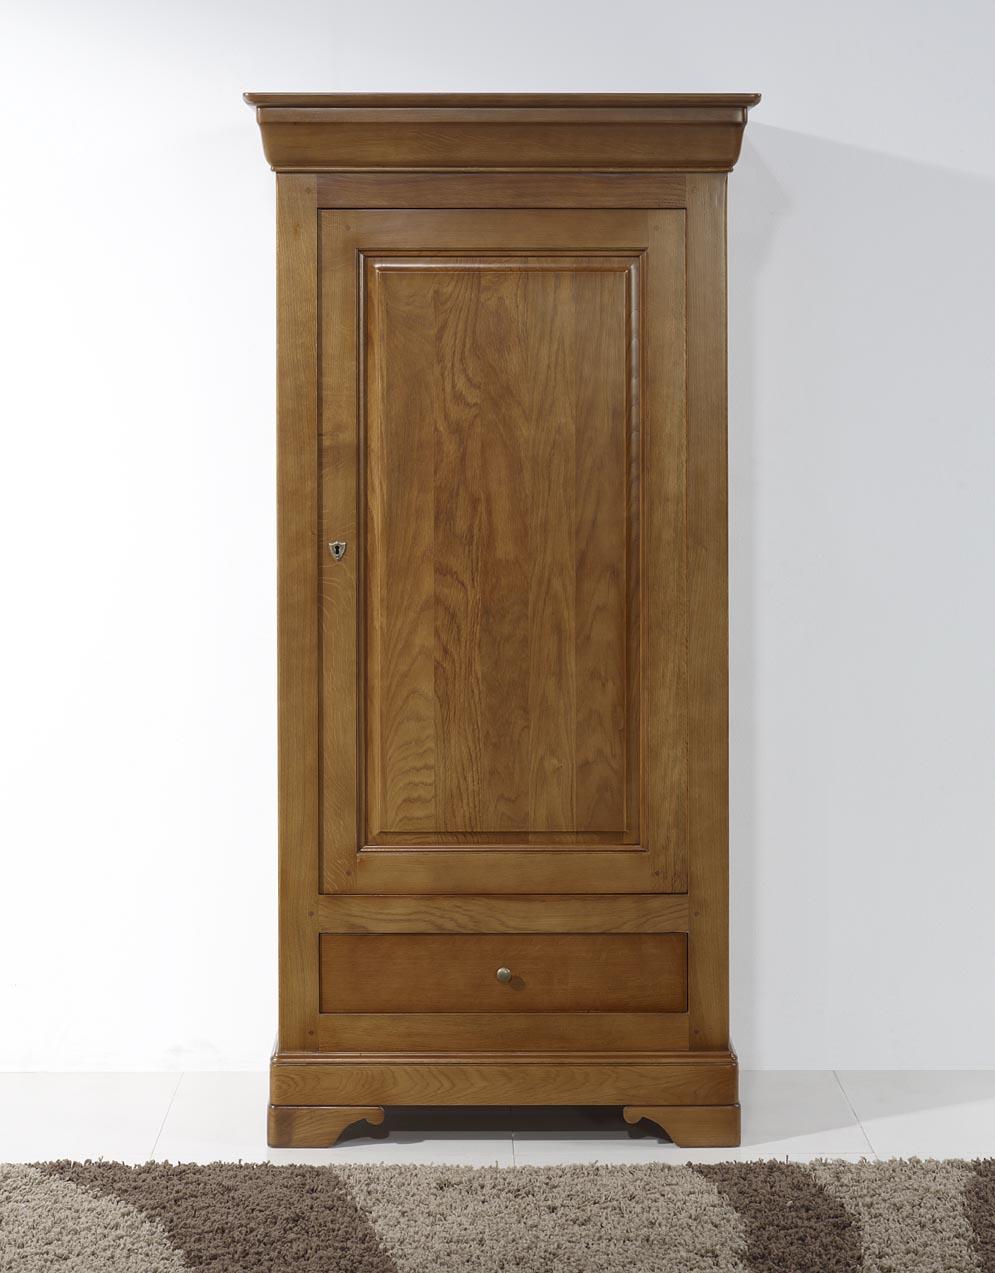 bonneti re 1 porte 1 tiroir en merisier massif de style louis philippe meuble en merisier massif. Black Bedroom Furniture Sets. Home Design Ideas